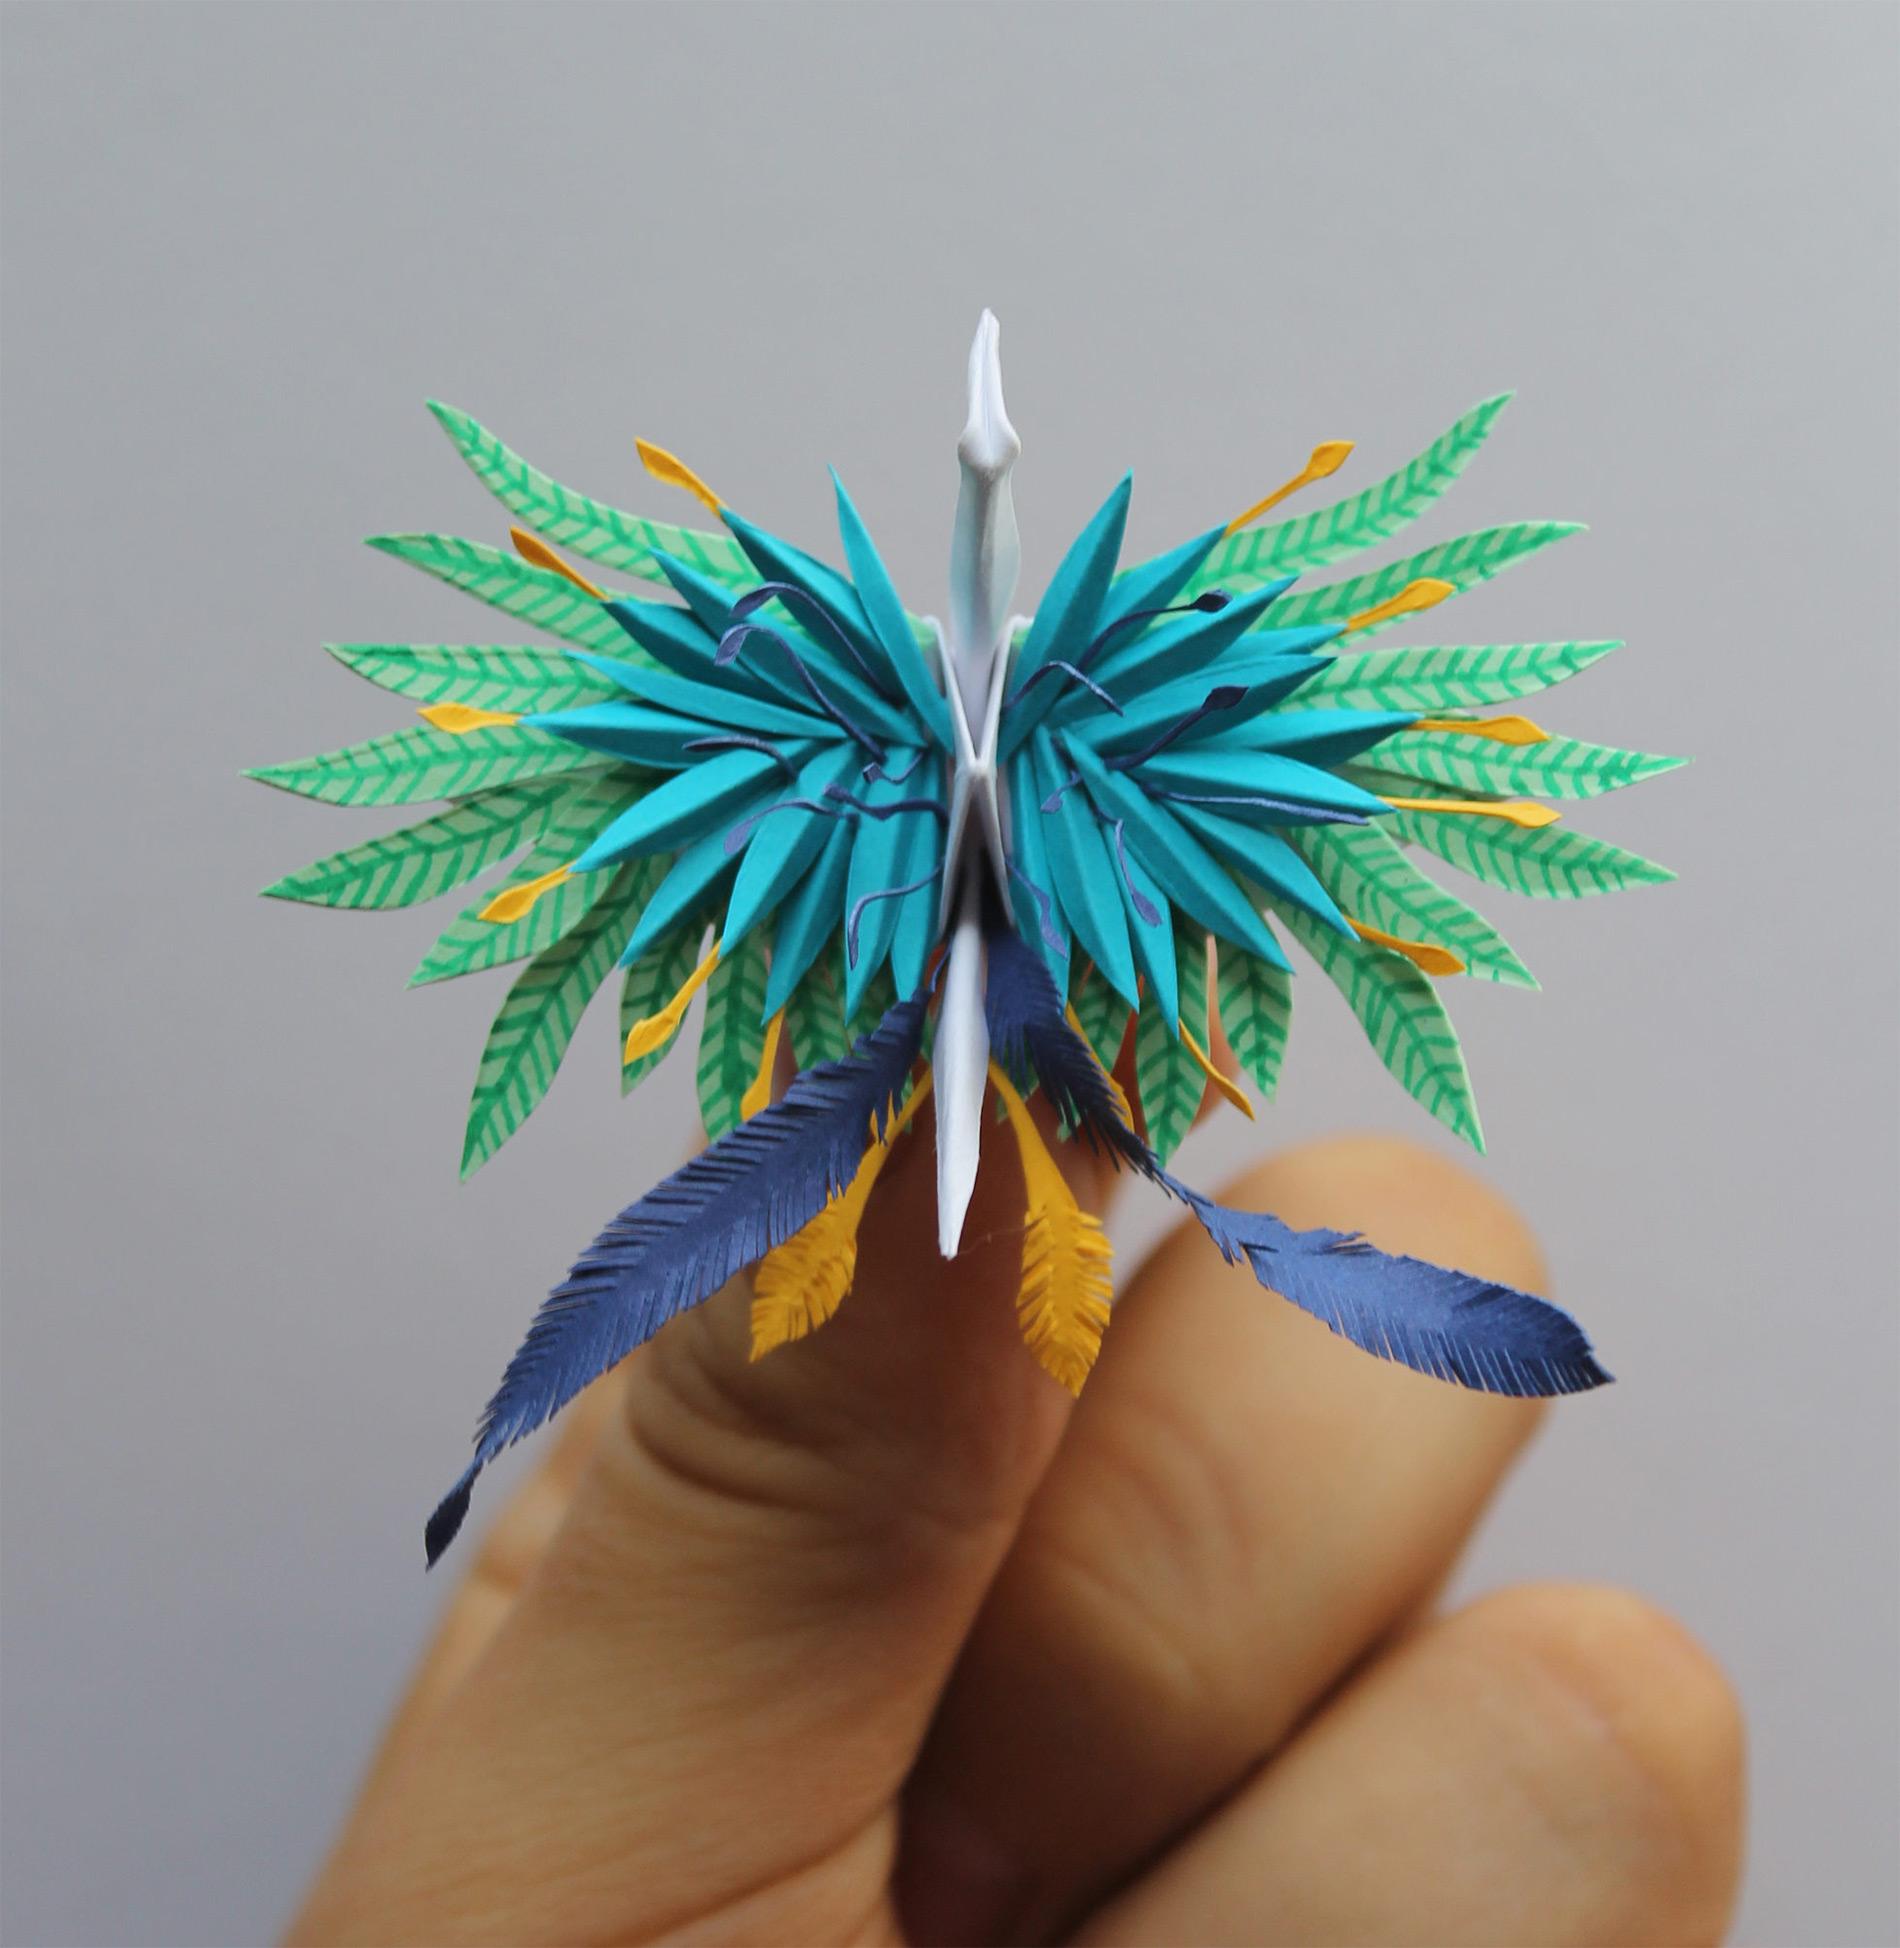 Cristian Marianciuc Creates A New Decorated Origami Paper